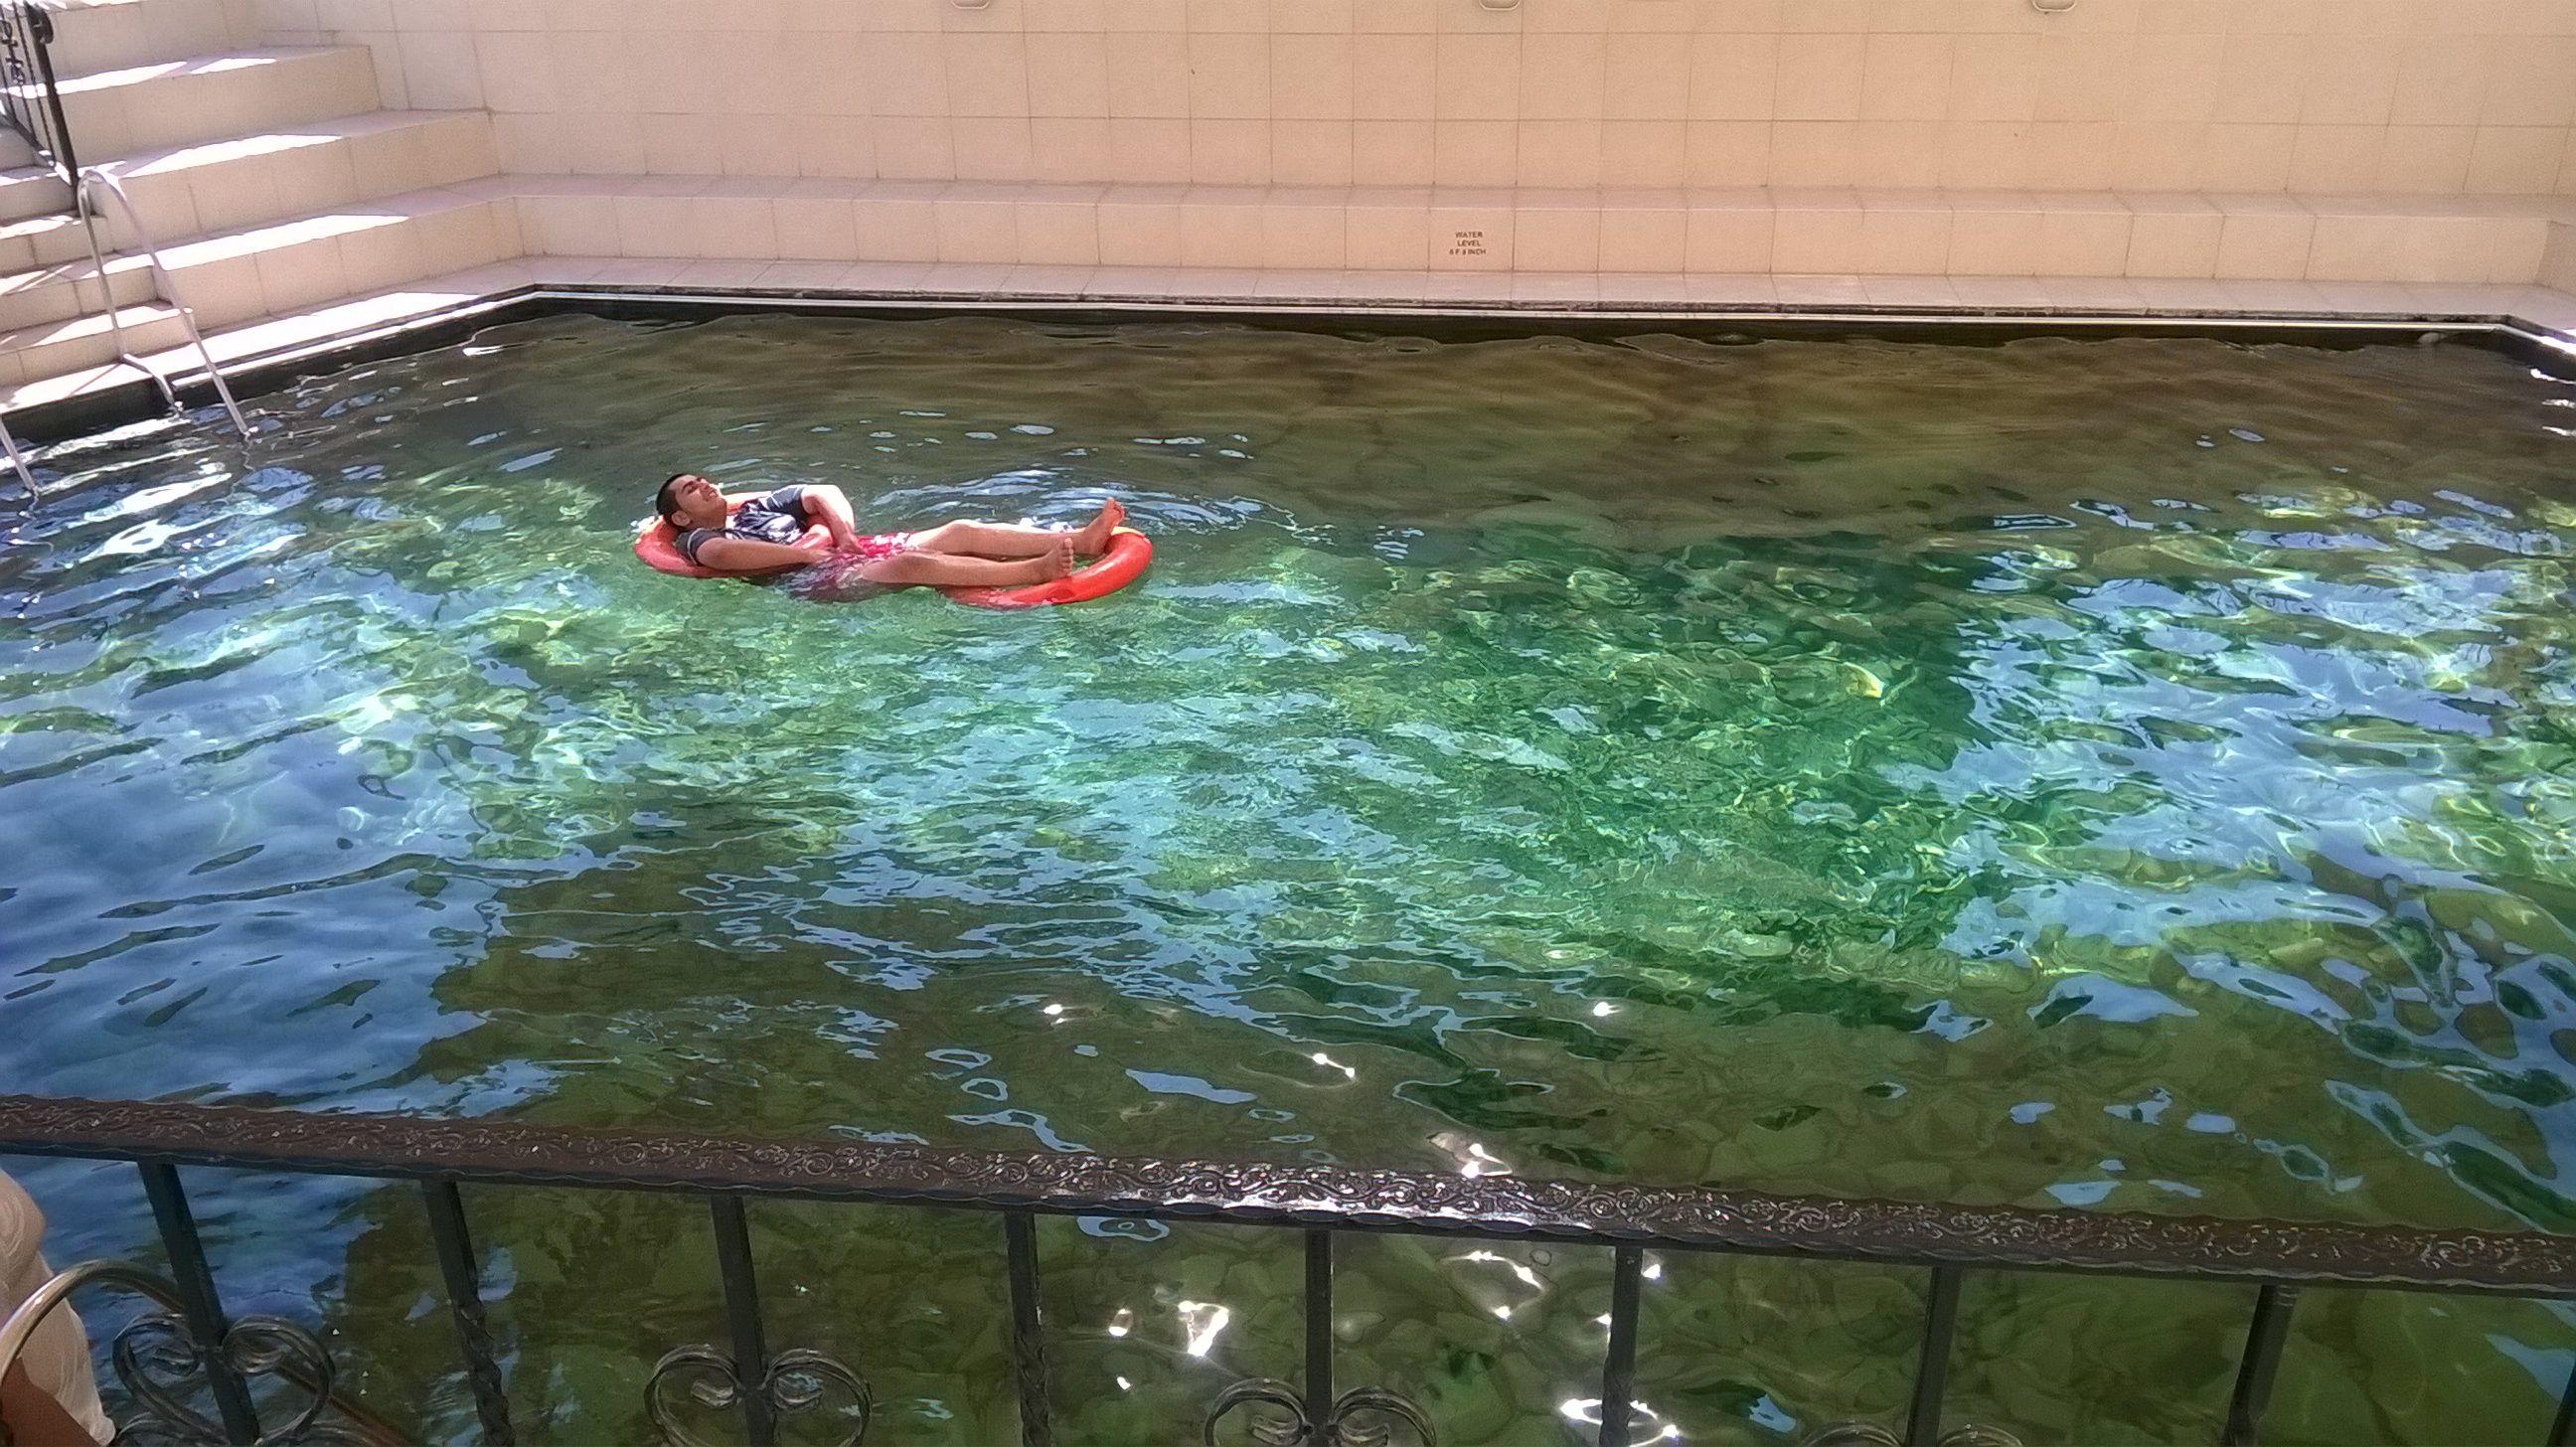 Khatt Spring Ras Al Khaimah UAE Is A Natural Hot Water Springs Located At The Foot Of Hajar